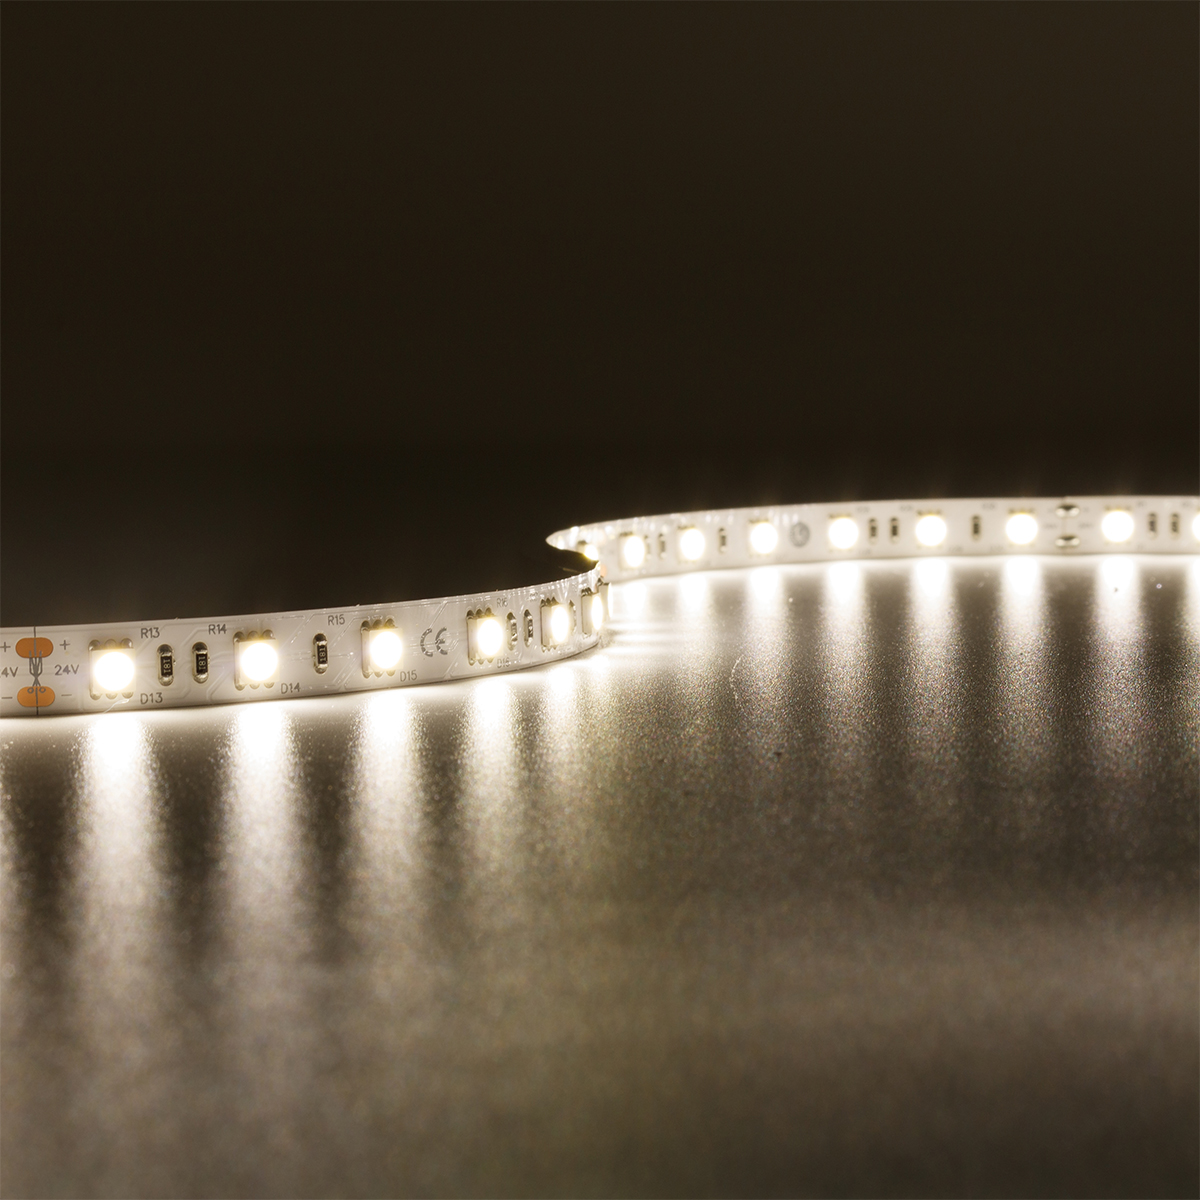 Strip Neutralweiß 24V LED Streifen 5M 14,4W/m 60LED/m 10mm IP20 4000K